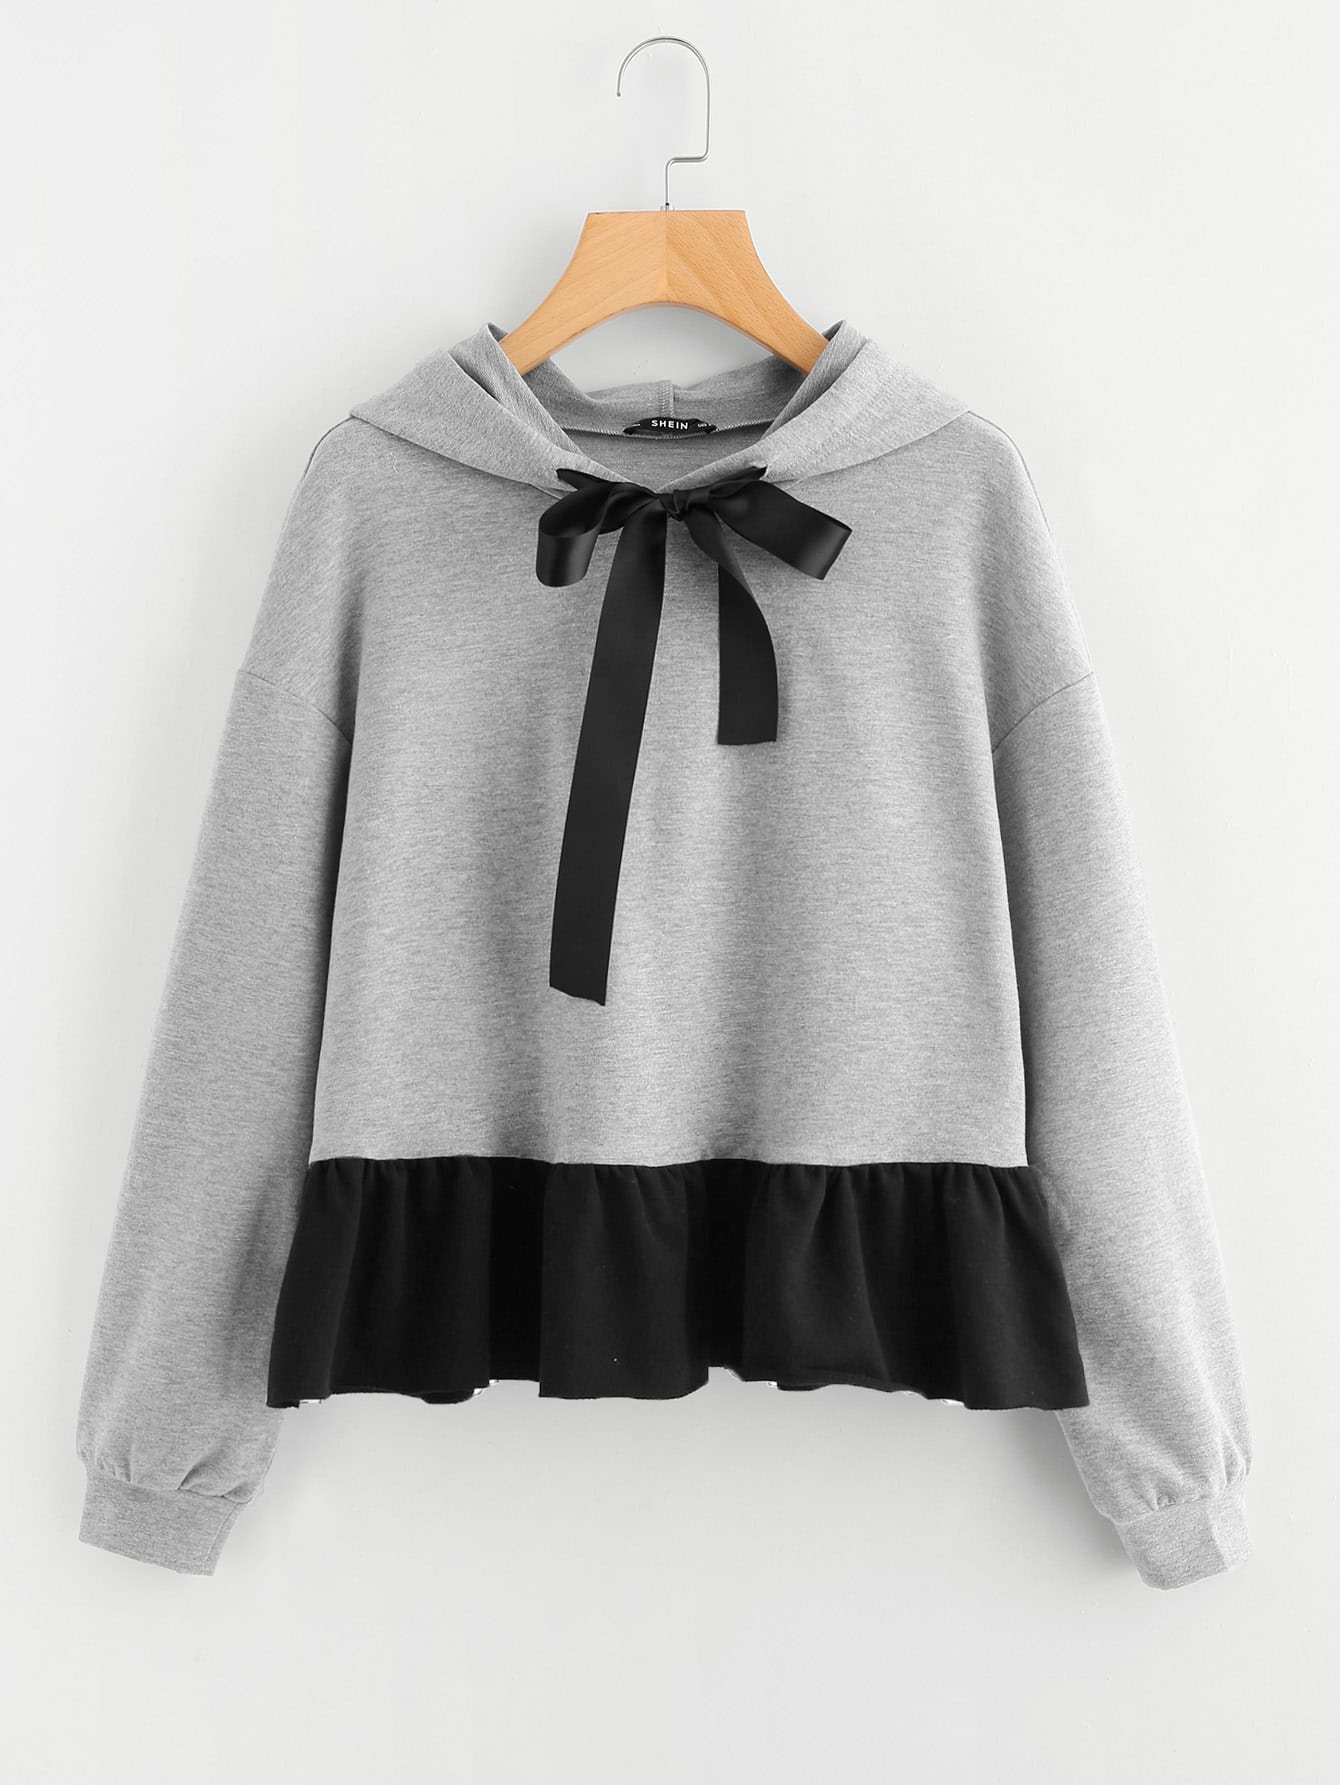 Contrast Ruffle Hem Heather Knit Hoodie contrast ruffle trim heather knit sweatshirt